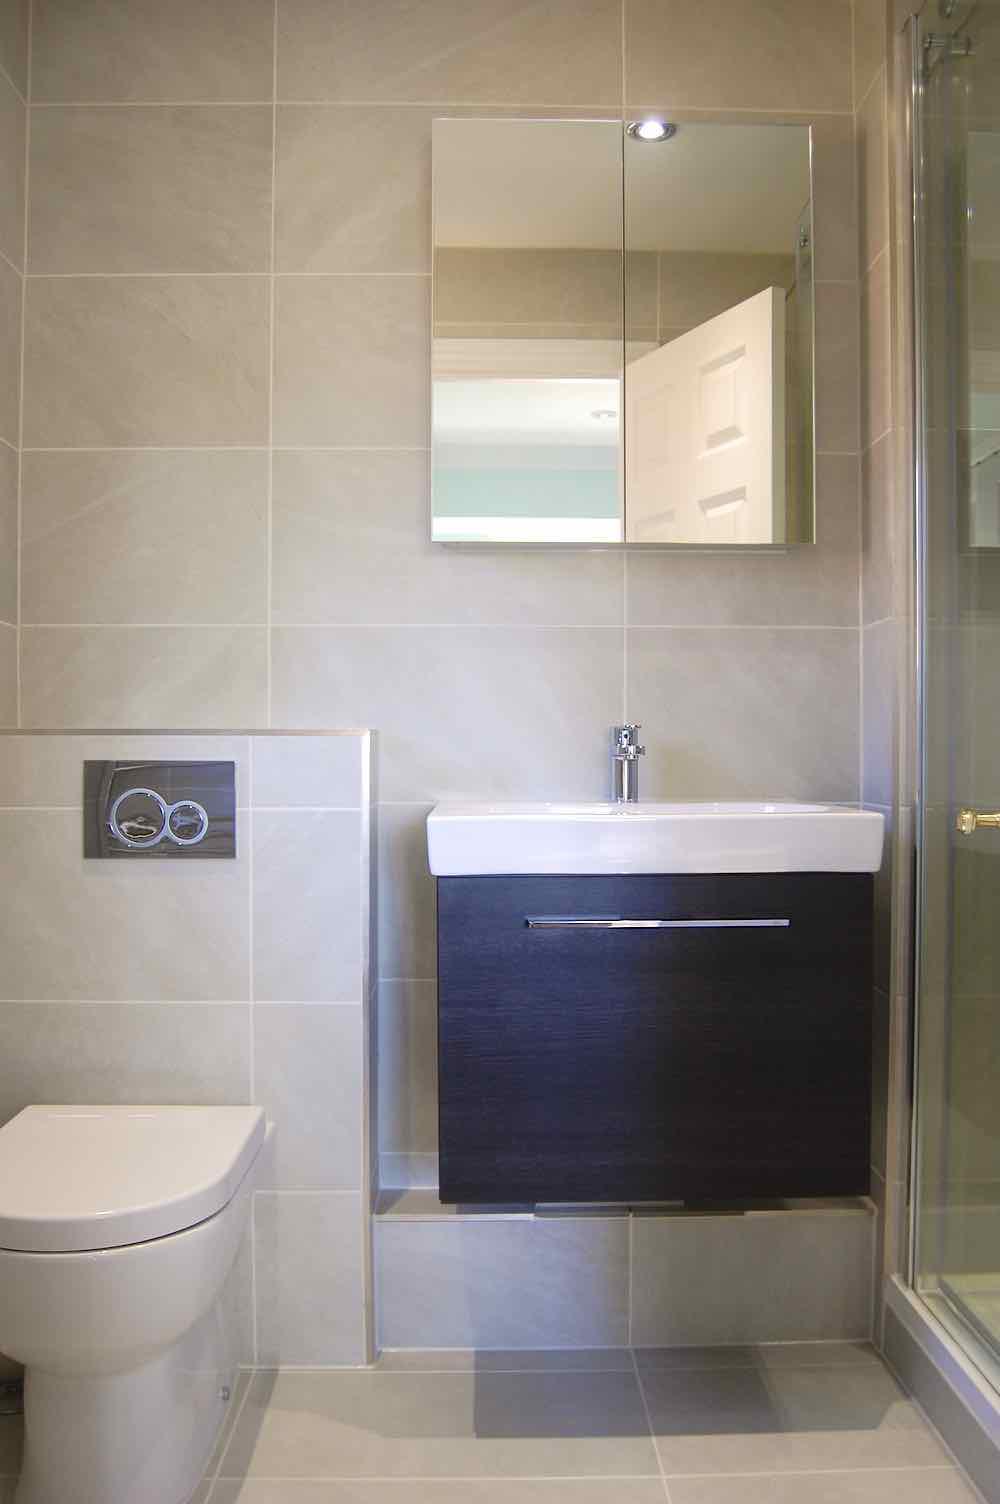 £9,850 - Shower-En-suite - minimal build/prep - Saneux, Crosswater, Flova brands. Porcelain tiles and recess in shower